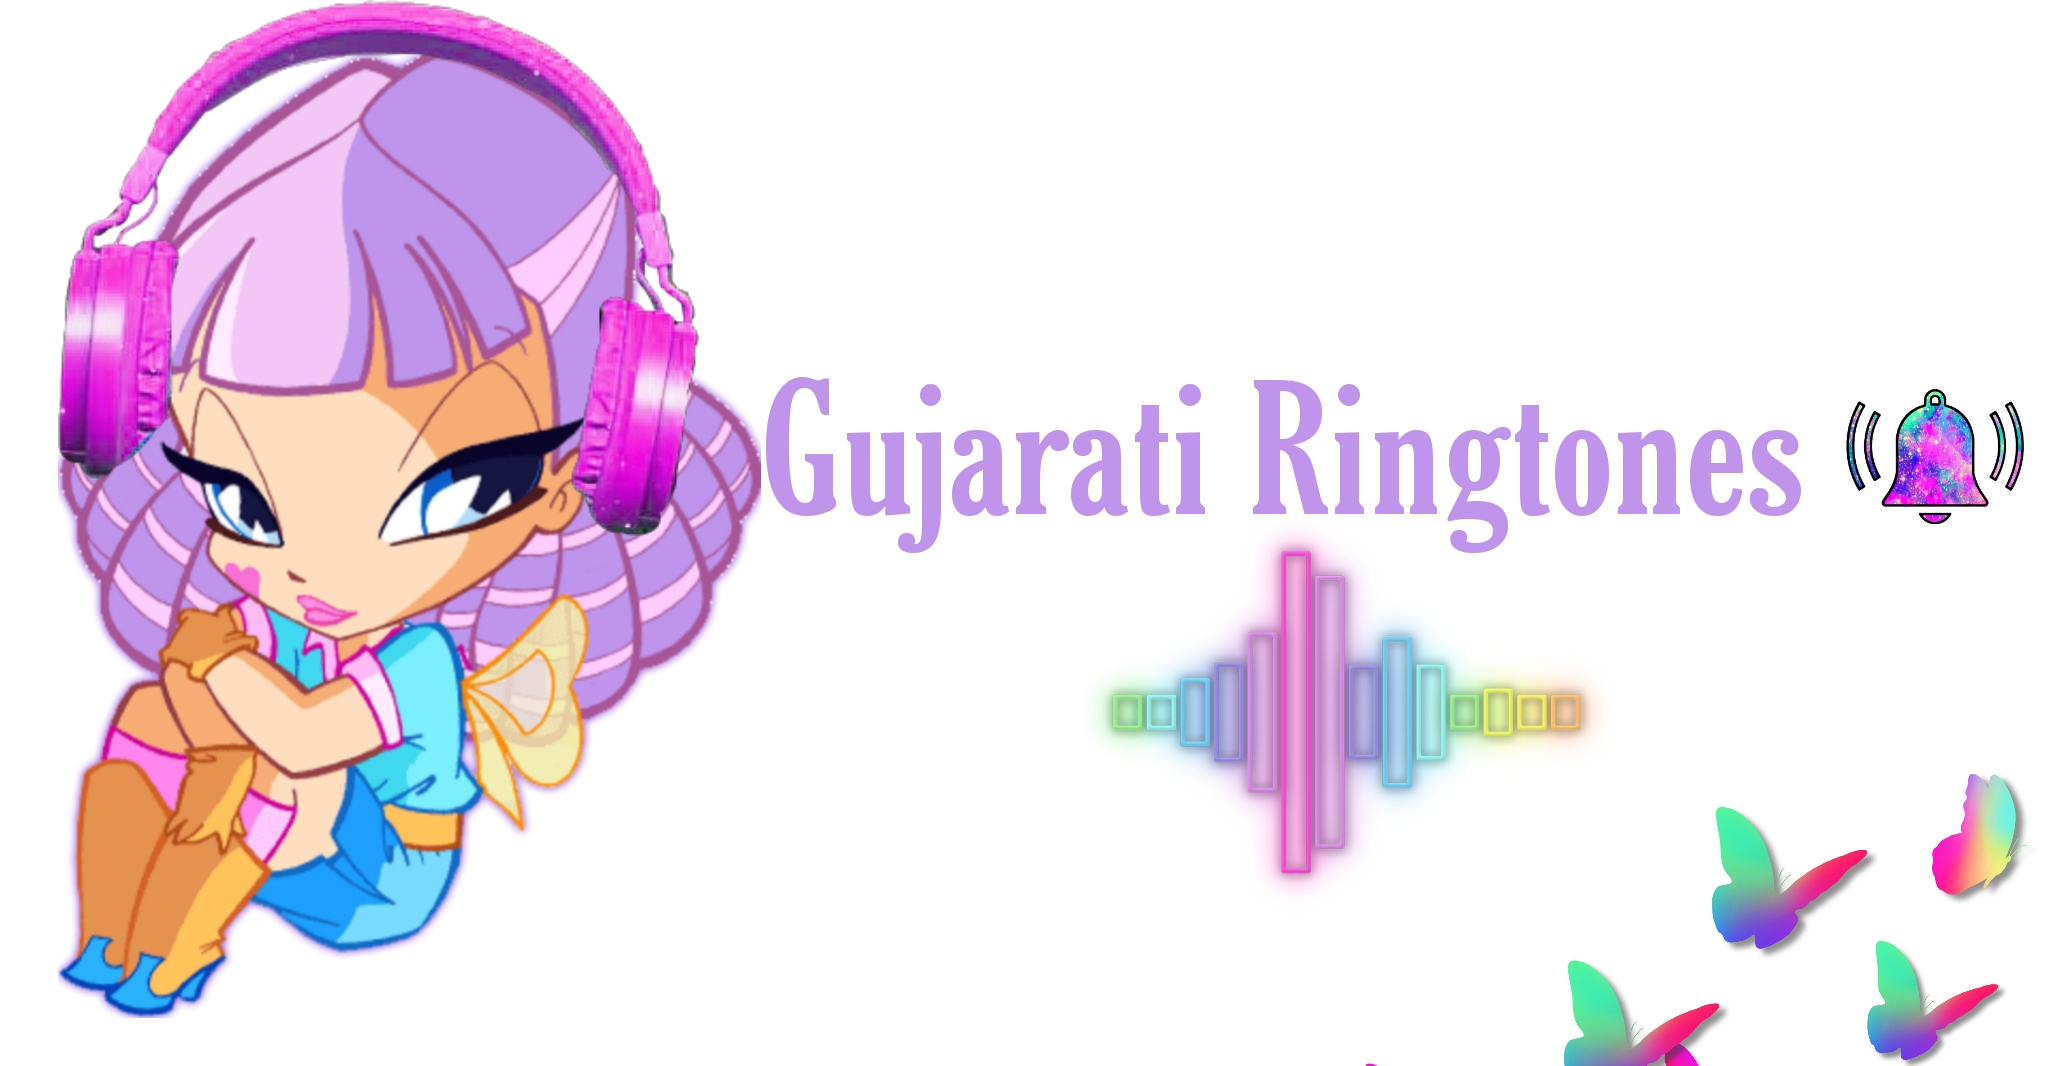 Gujarati Ringtone, Gujarati Ringtones Download, Gujarati Ringtone Download